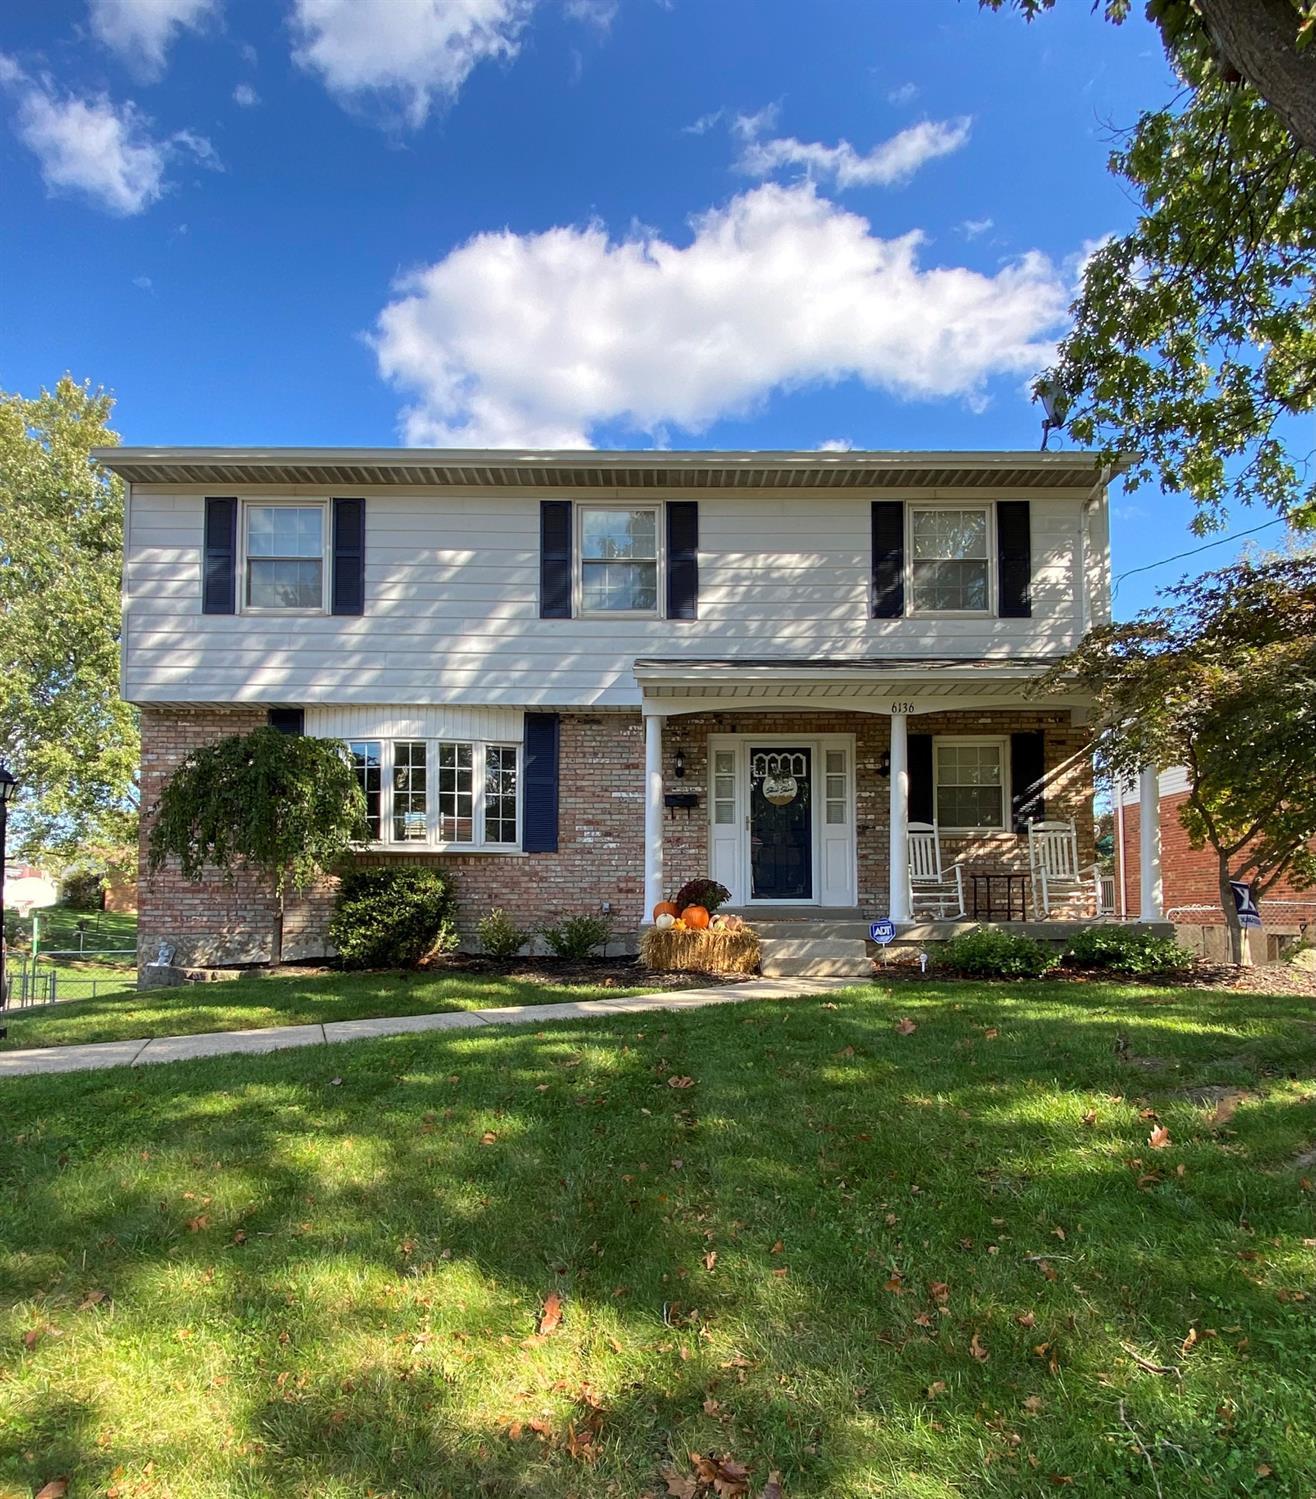 6136 LaGrange Lane, Green Twp, Ohio 45239, 4 Bedrooms Bedrooms, 8 Rooms Rooms,2 BathroomsBathrooms,Single Family Residence,For Sale,LaGrange,1719924